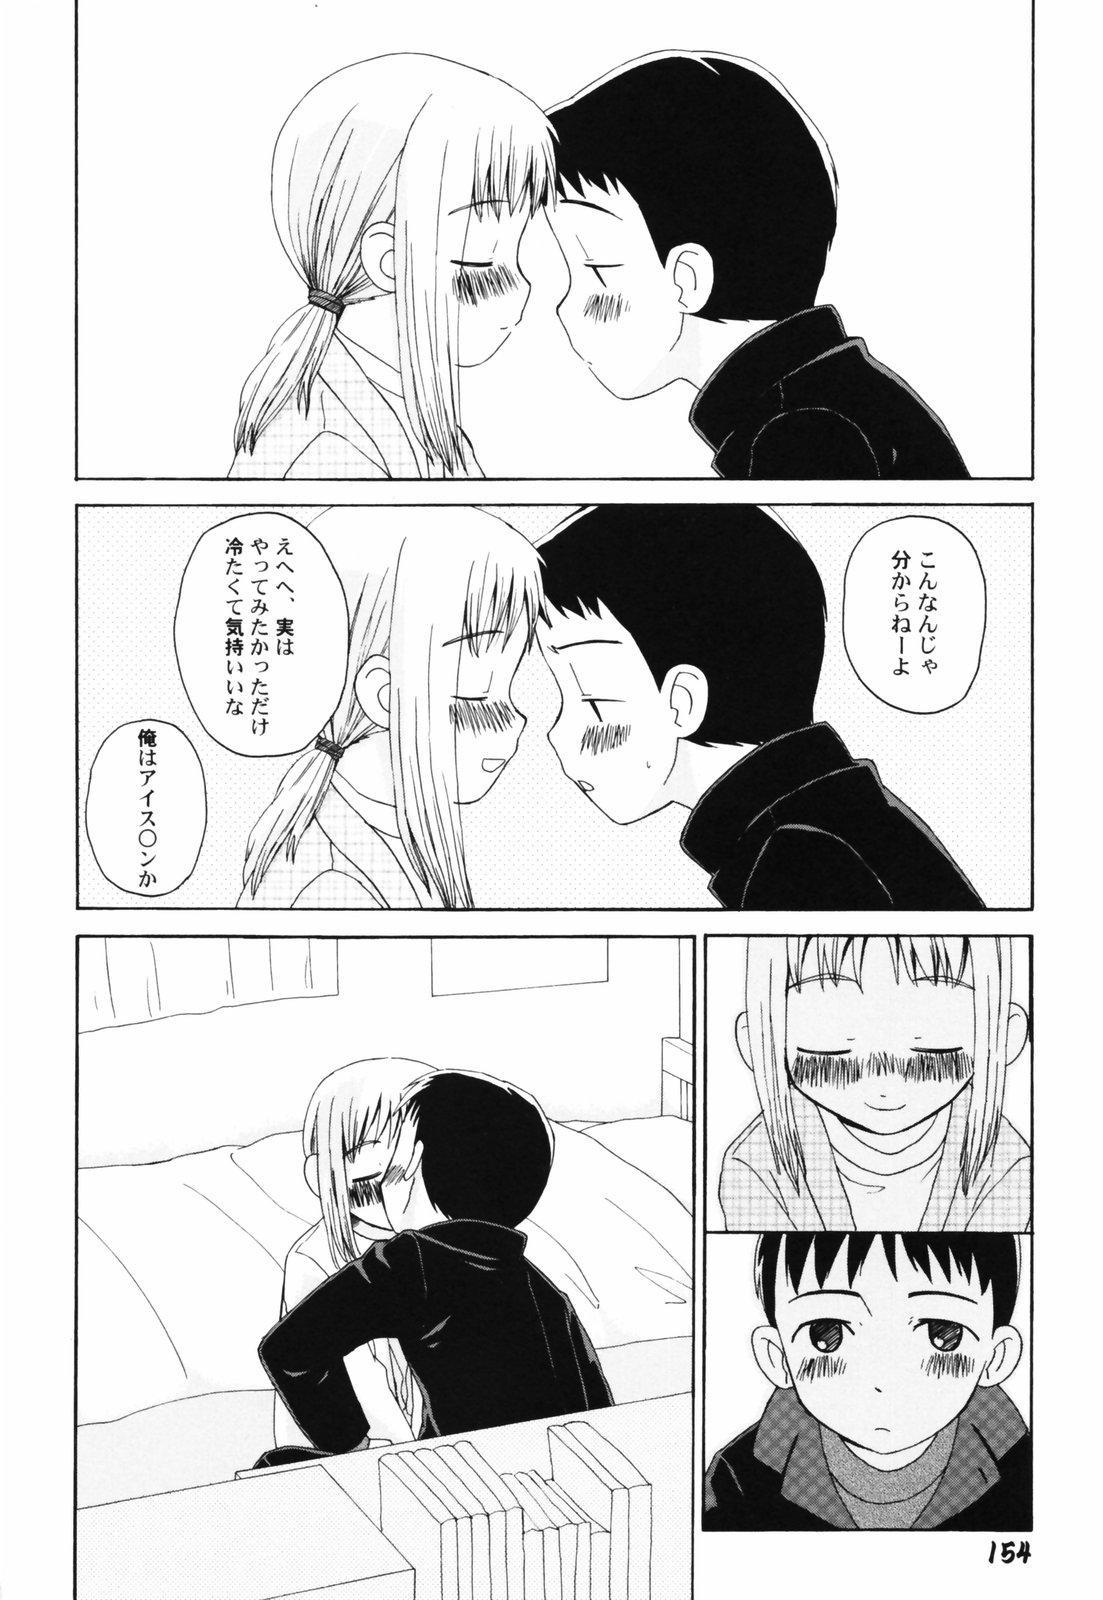 Hanjuku Shoujo 156